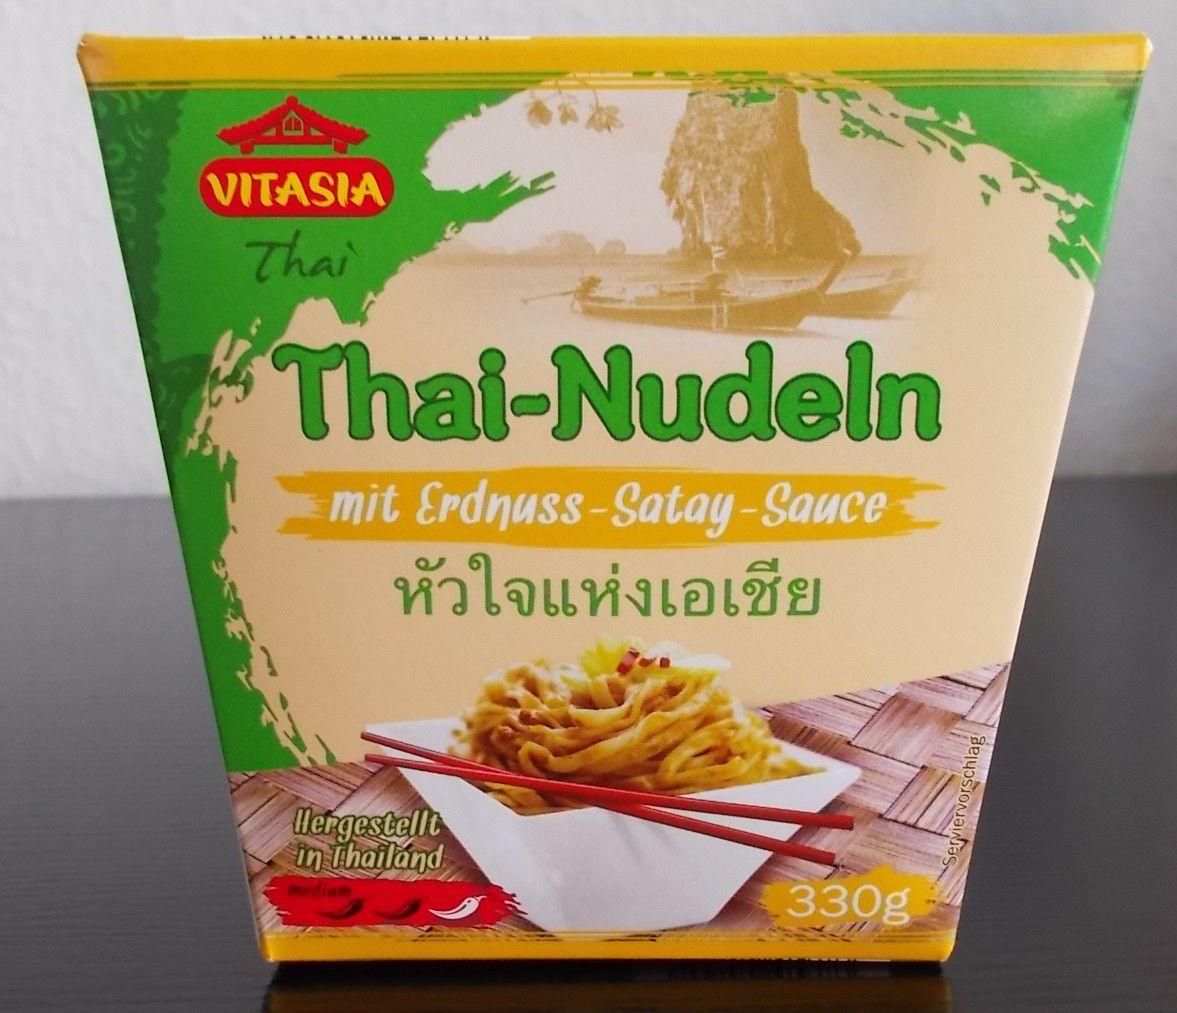 Lidl Vitasia Thai Nudeln Mit Erdnuss Satay Sauce Blogtestesser